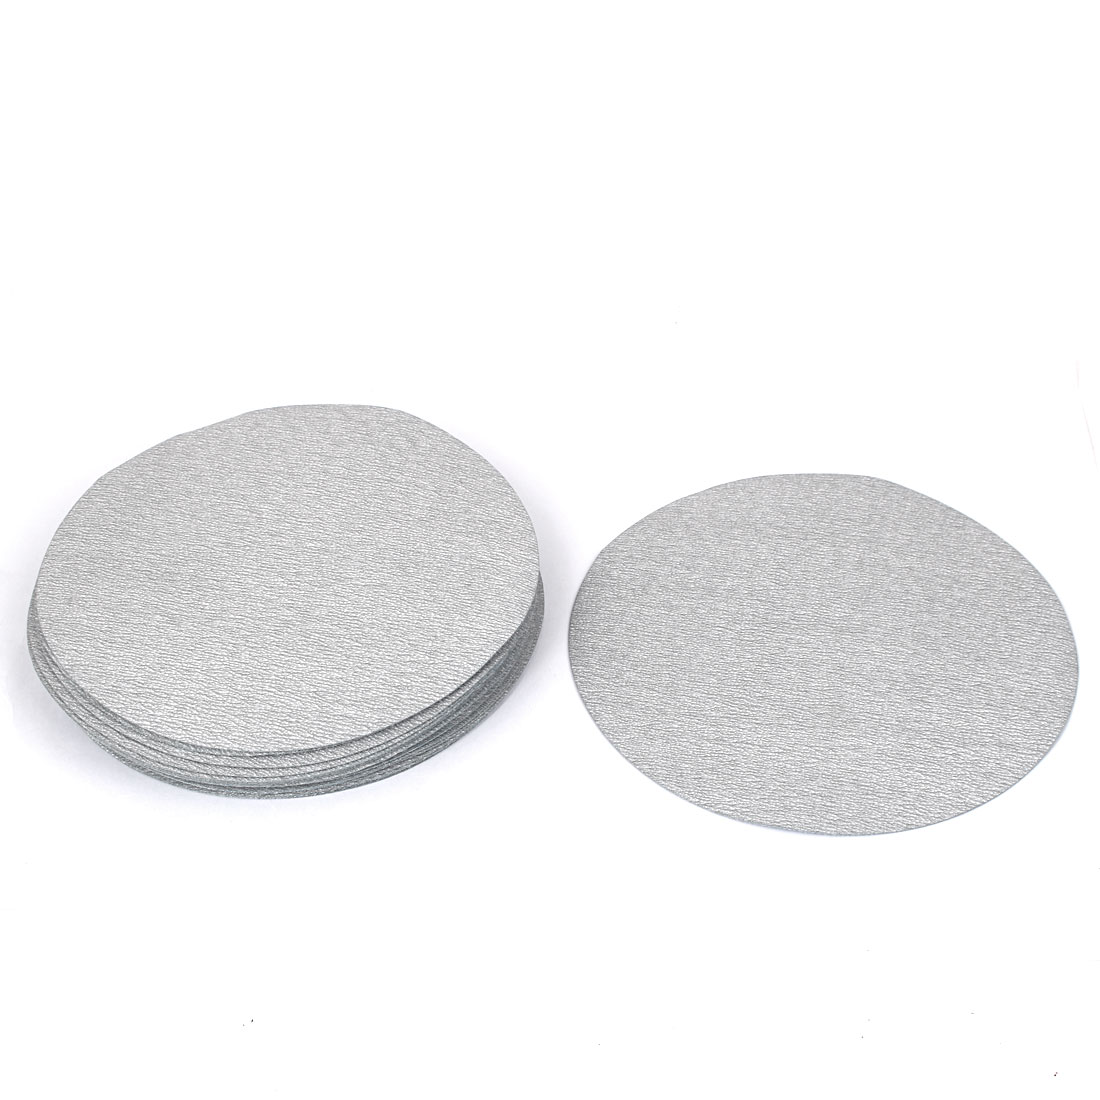 "7"" Dia Polishing Round Dry Abrasive Sanding Sandpaper Sheet Disc 800 Grit 20pcs"